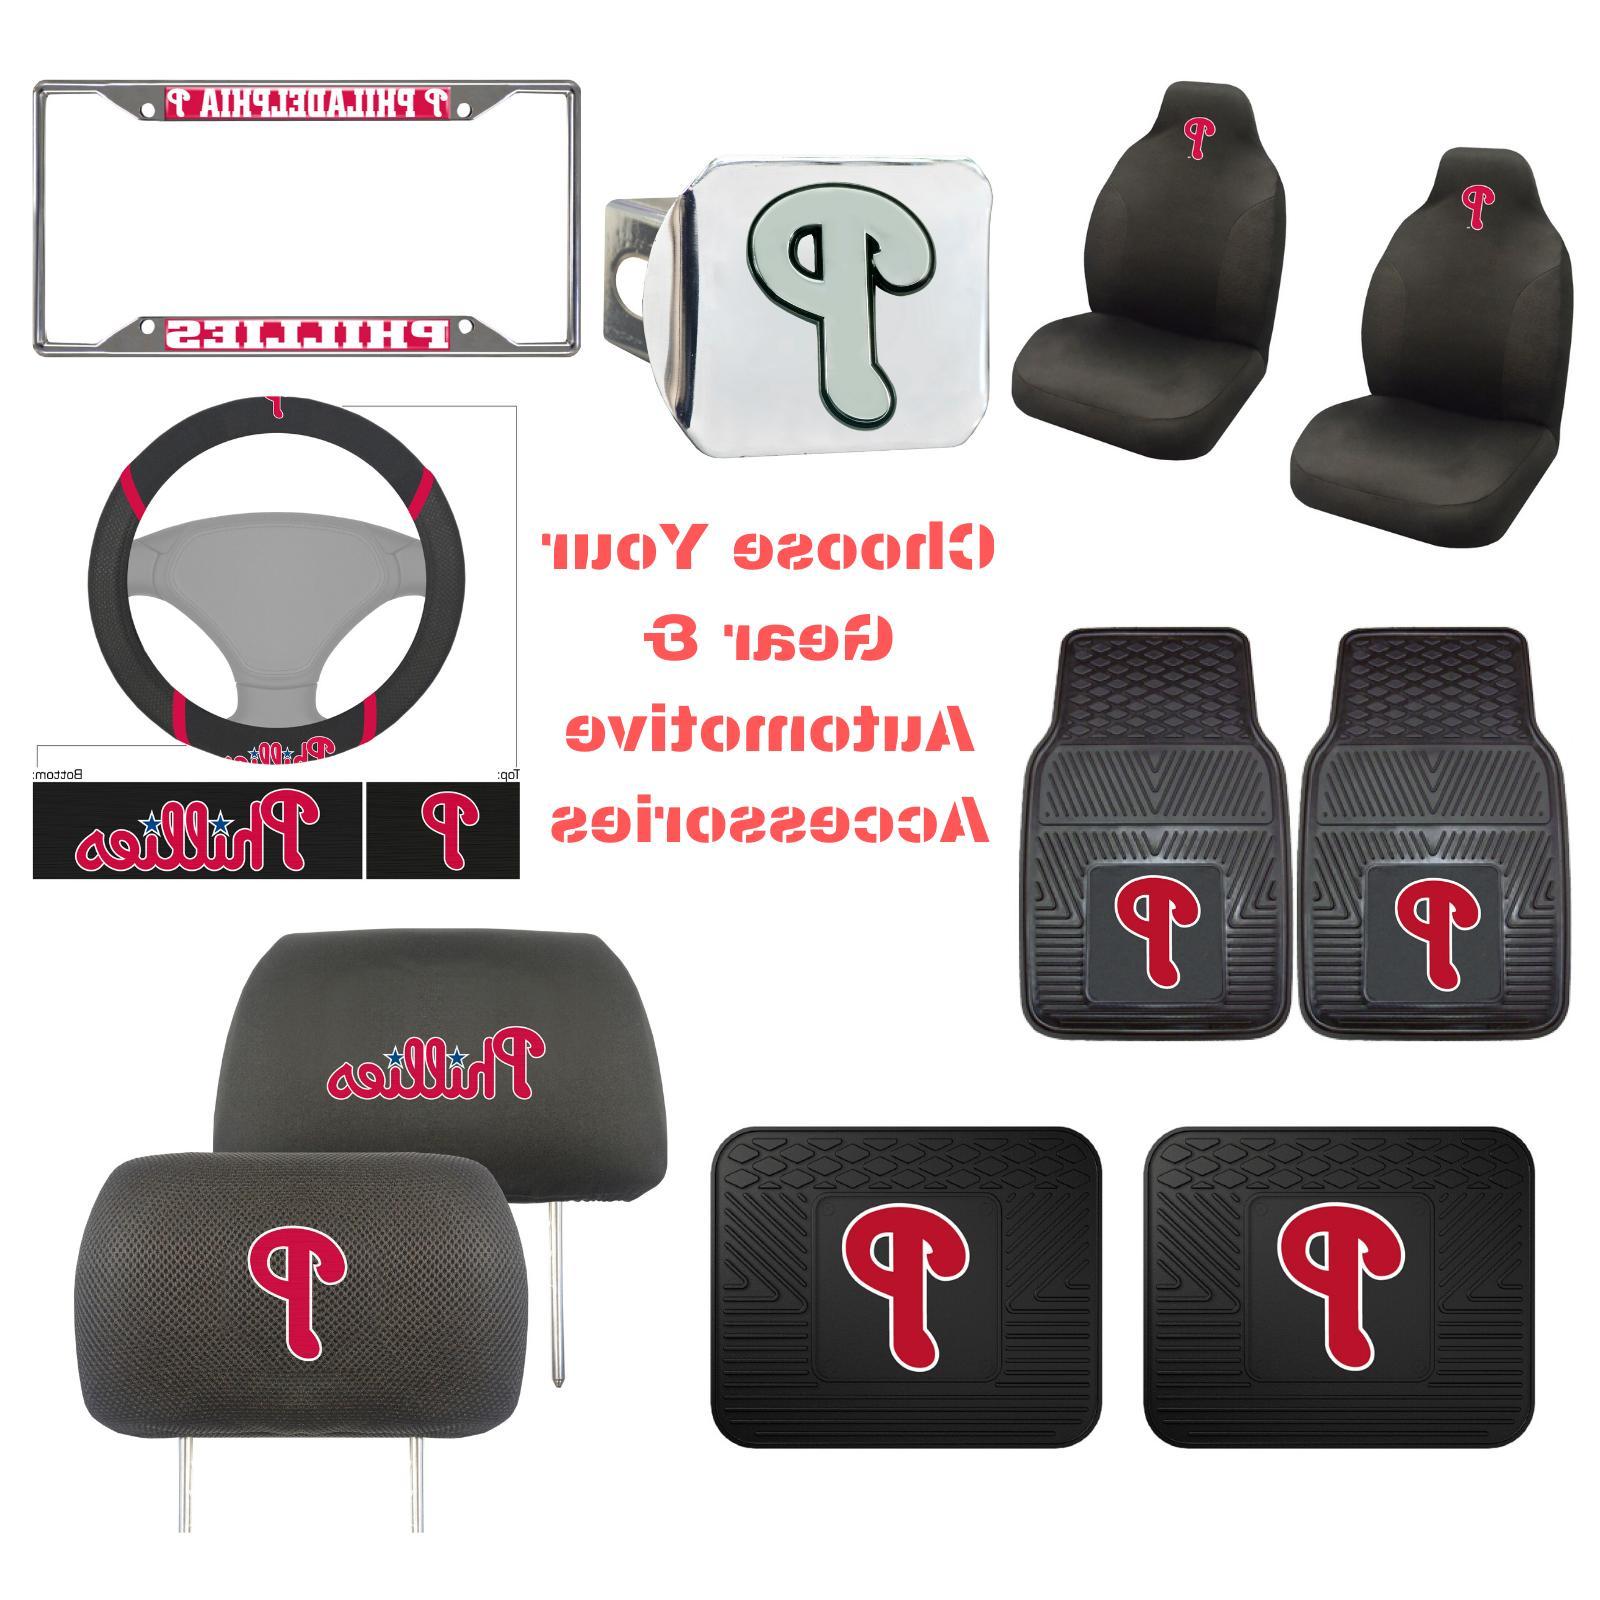 mlb philadelphia phillies choose your gear auto